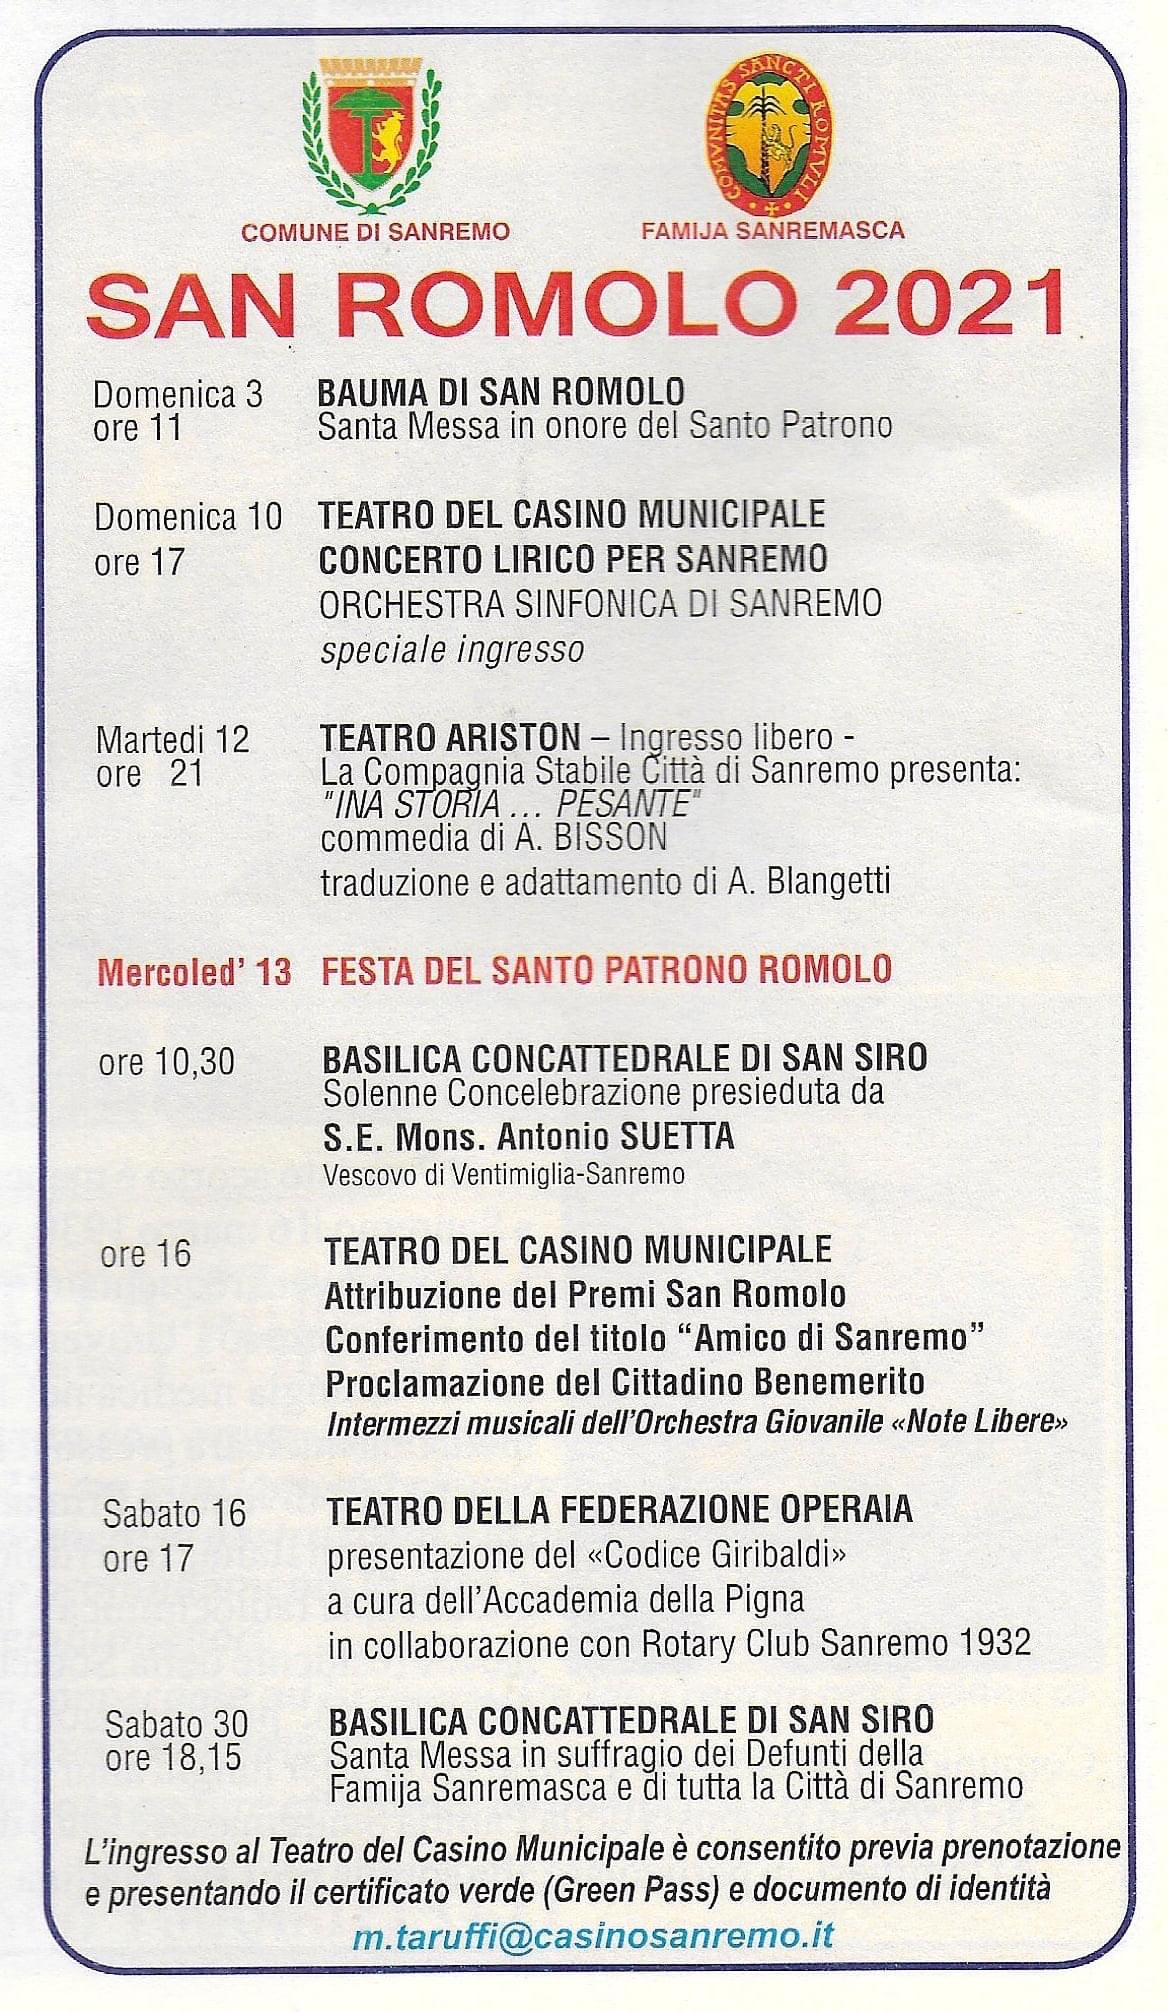 San Romolo 2021